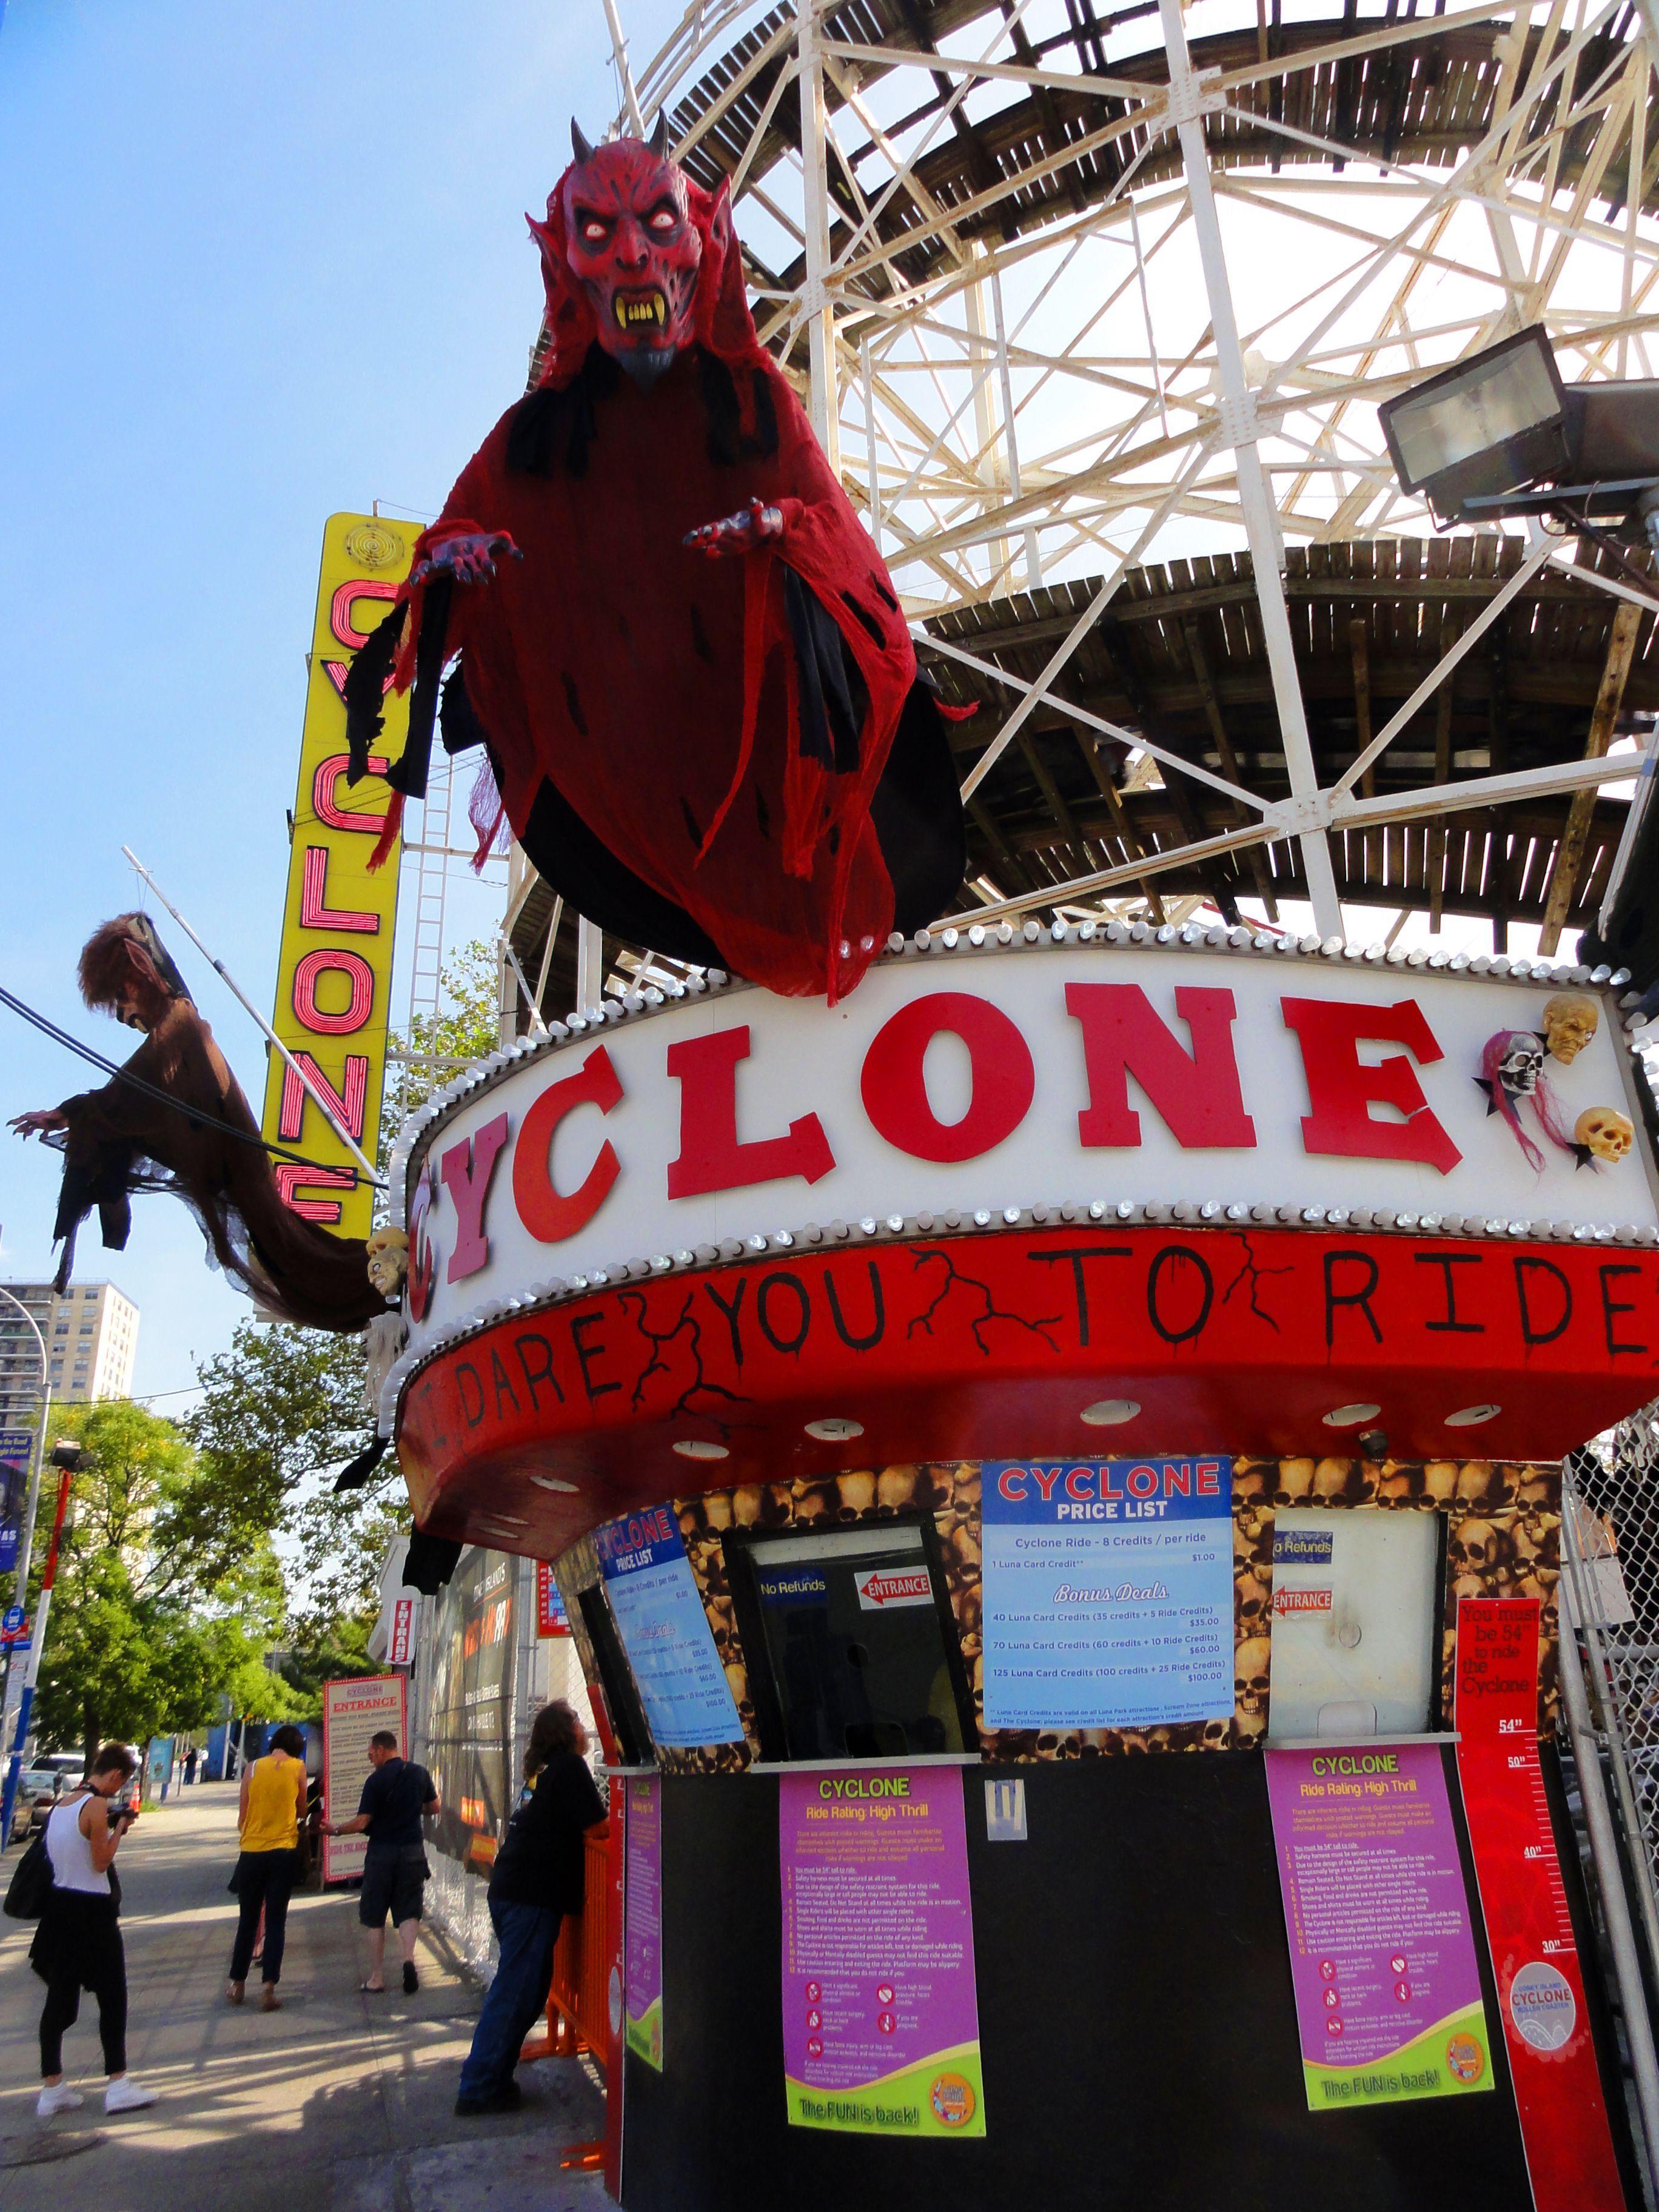 Cyclone Roller Coaster Visiting nyc, Roller coaster, Nyc